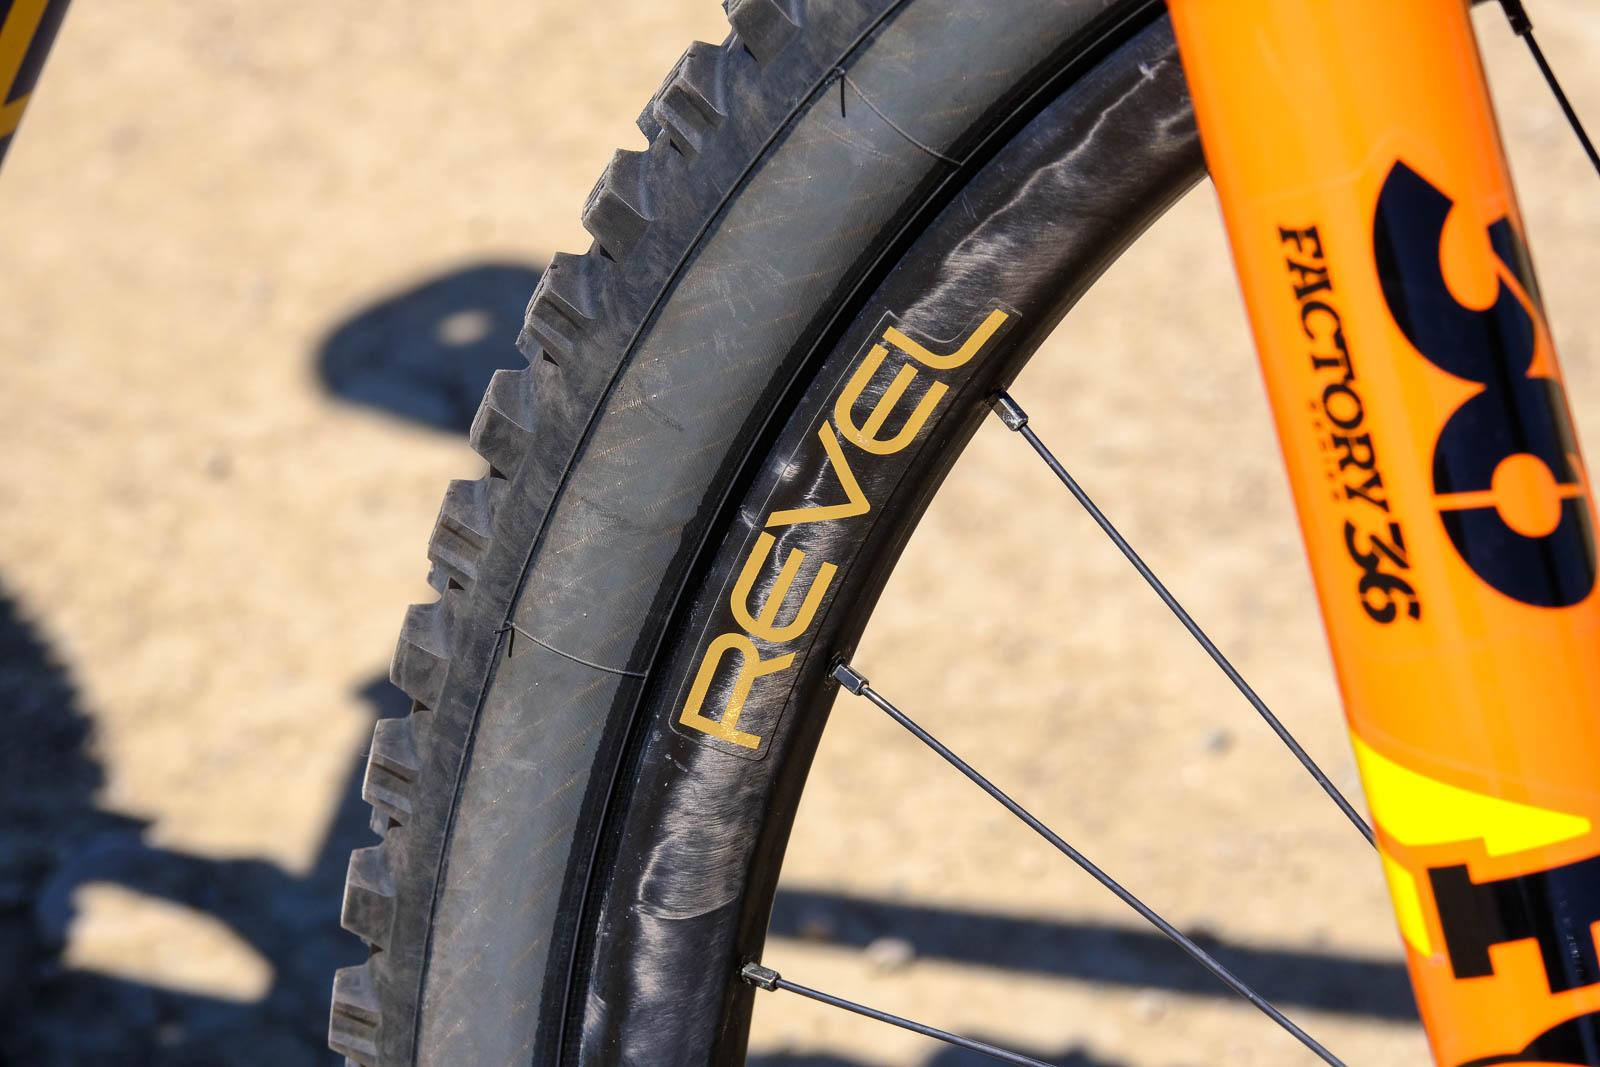 Revel's recyclable RW30 carbon mountain bike wheels